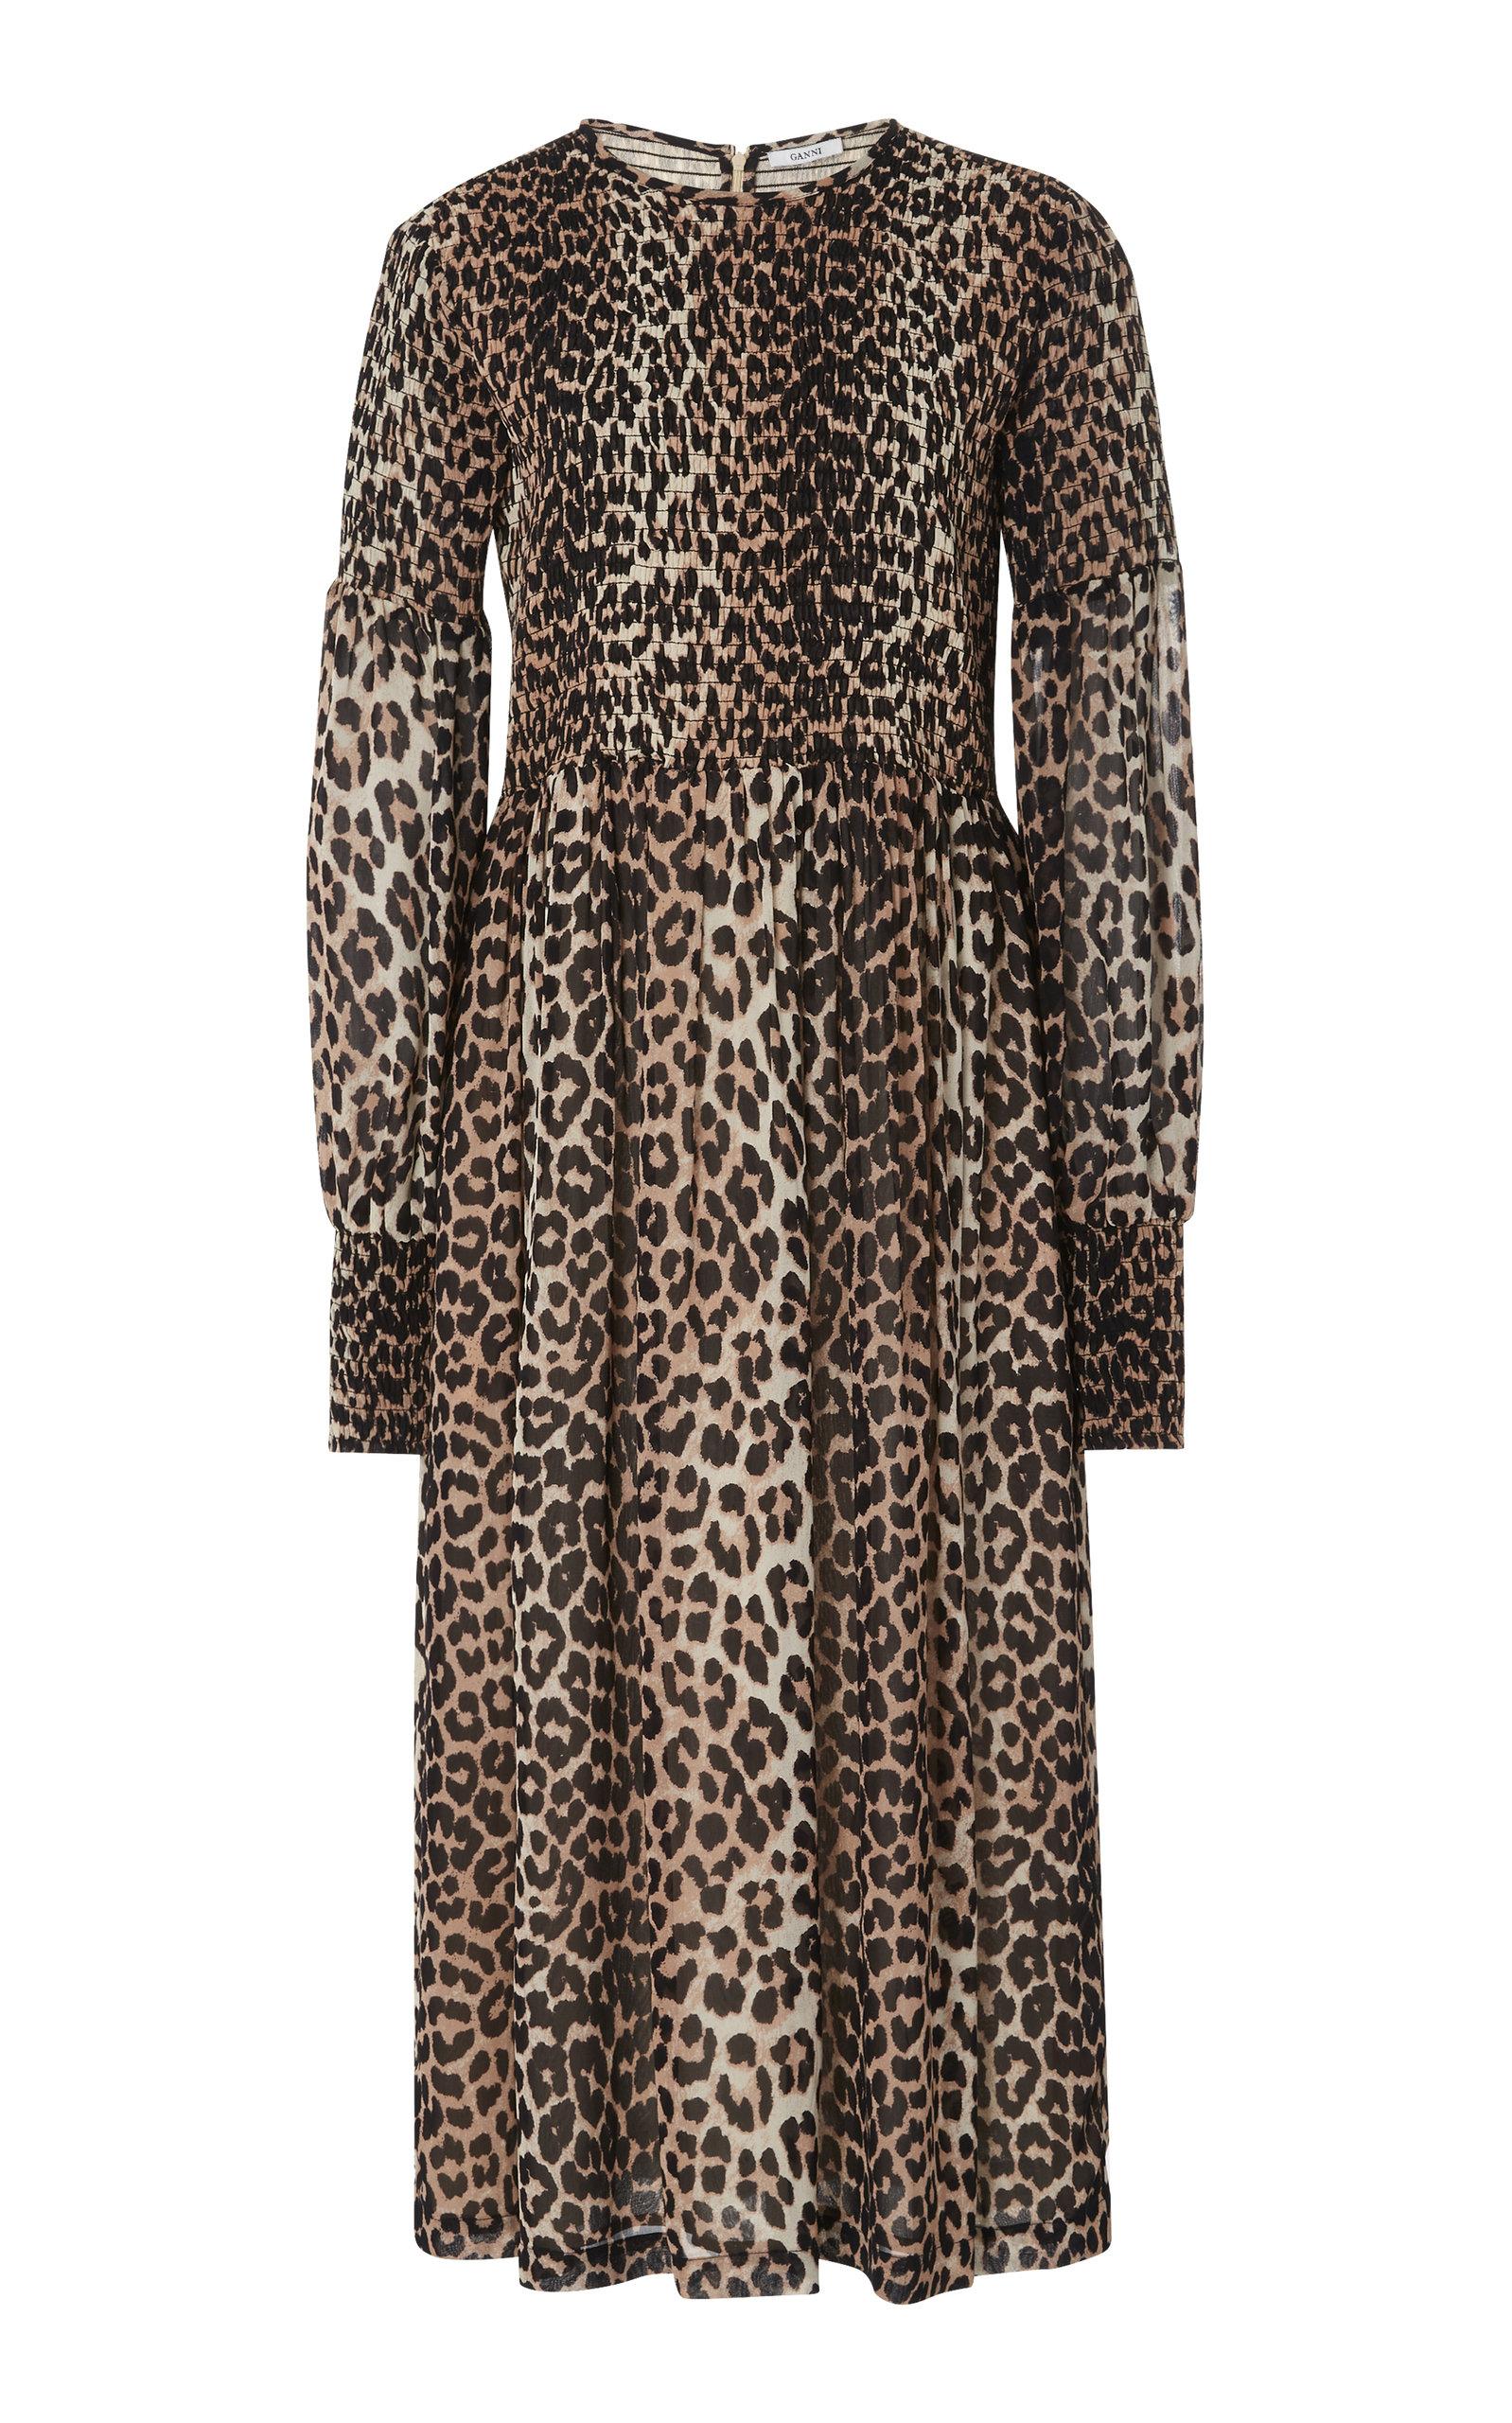 0cac8393 Smocked Leopard-Print Georgette Dress by Ganni   Moda Operandi